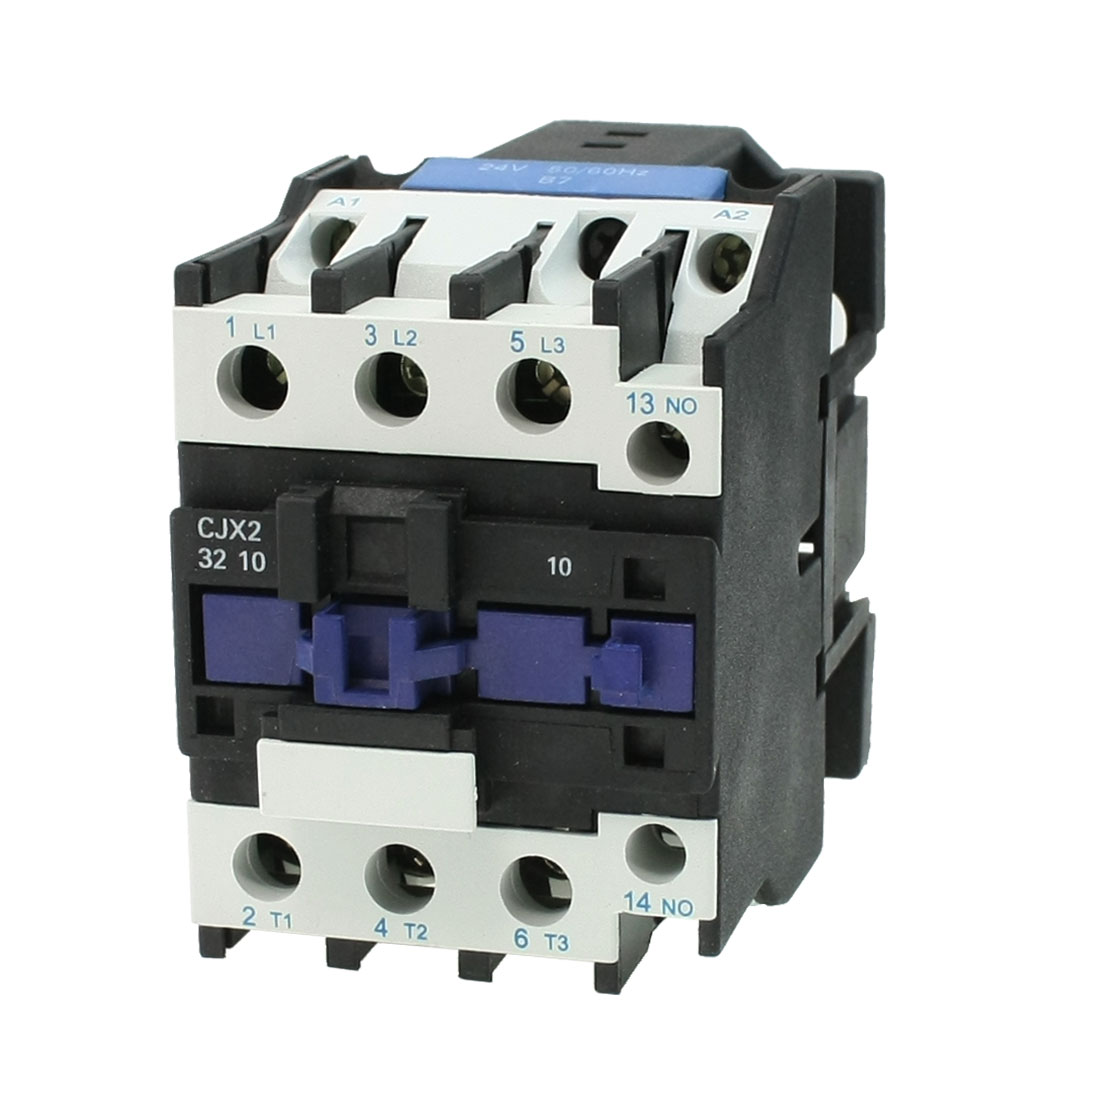 CJX2-32 380V Coil 50A DIN Rail 3P Three Pole 1NO 1NC 24V AC Contactor